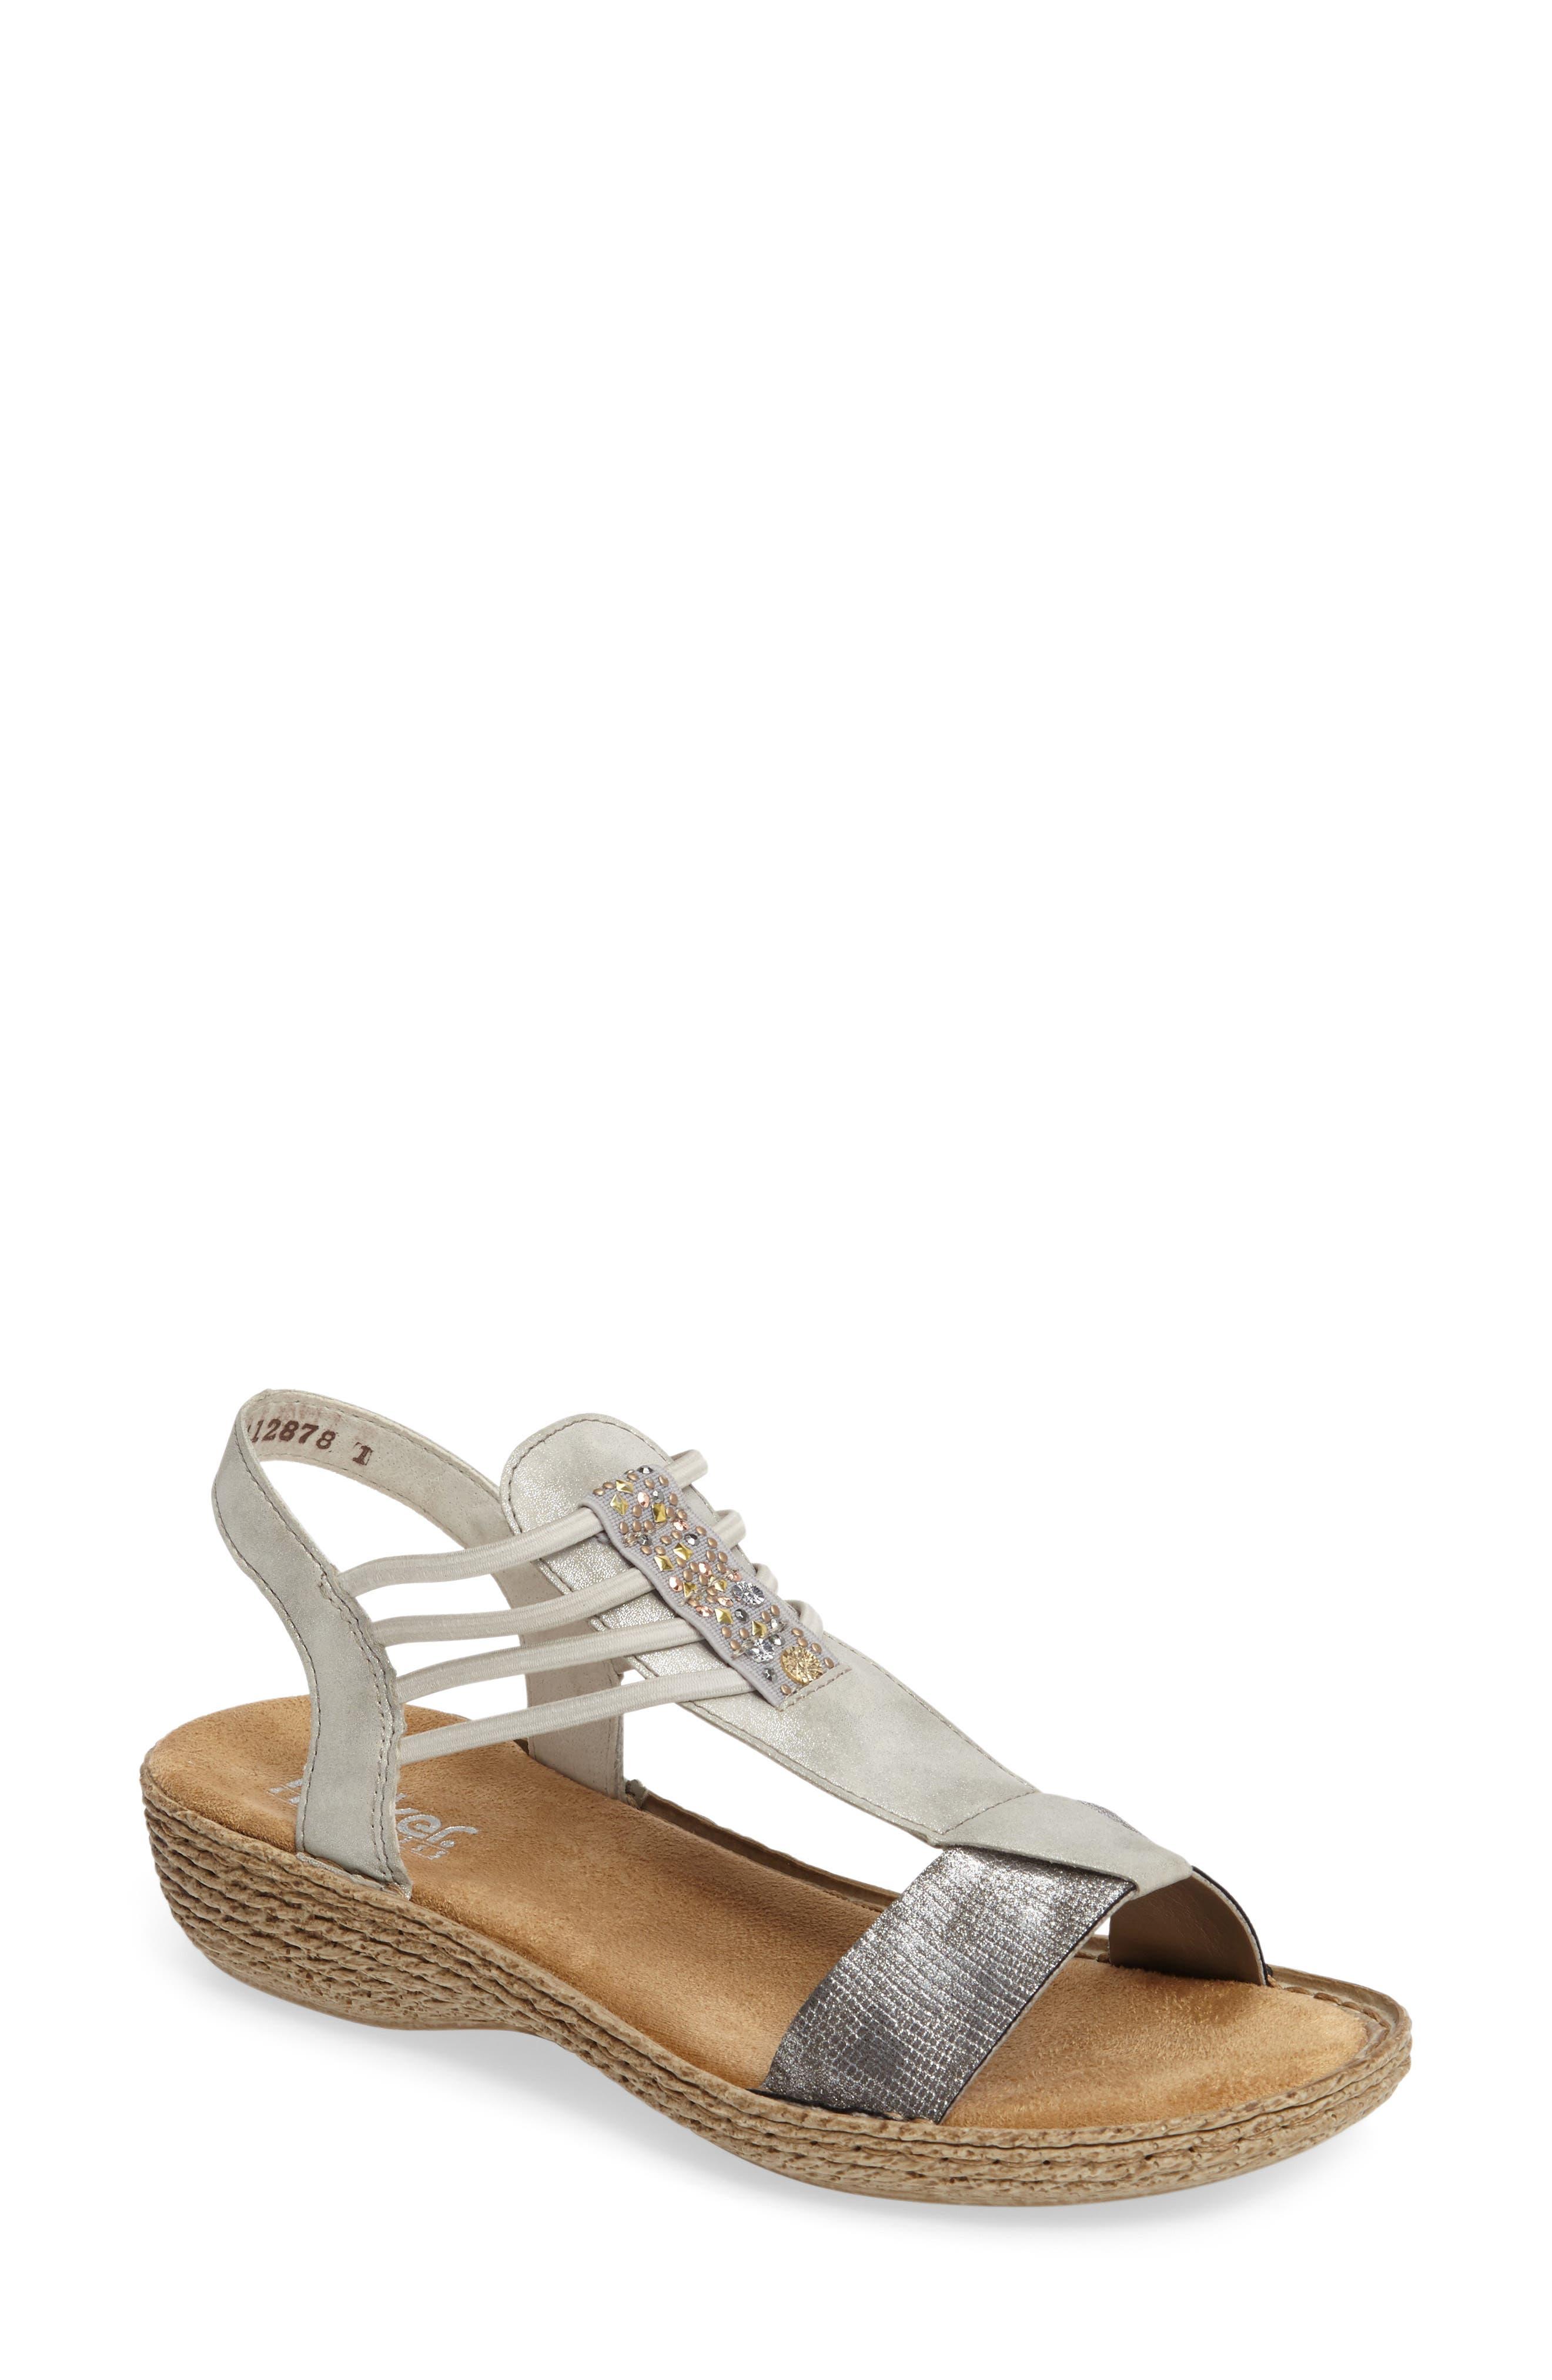 Regina T-Strap Sandal,                             Main thumbnail 1, color,                             Grey Fabric